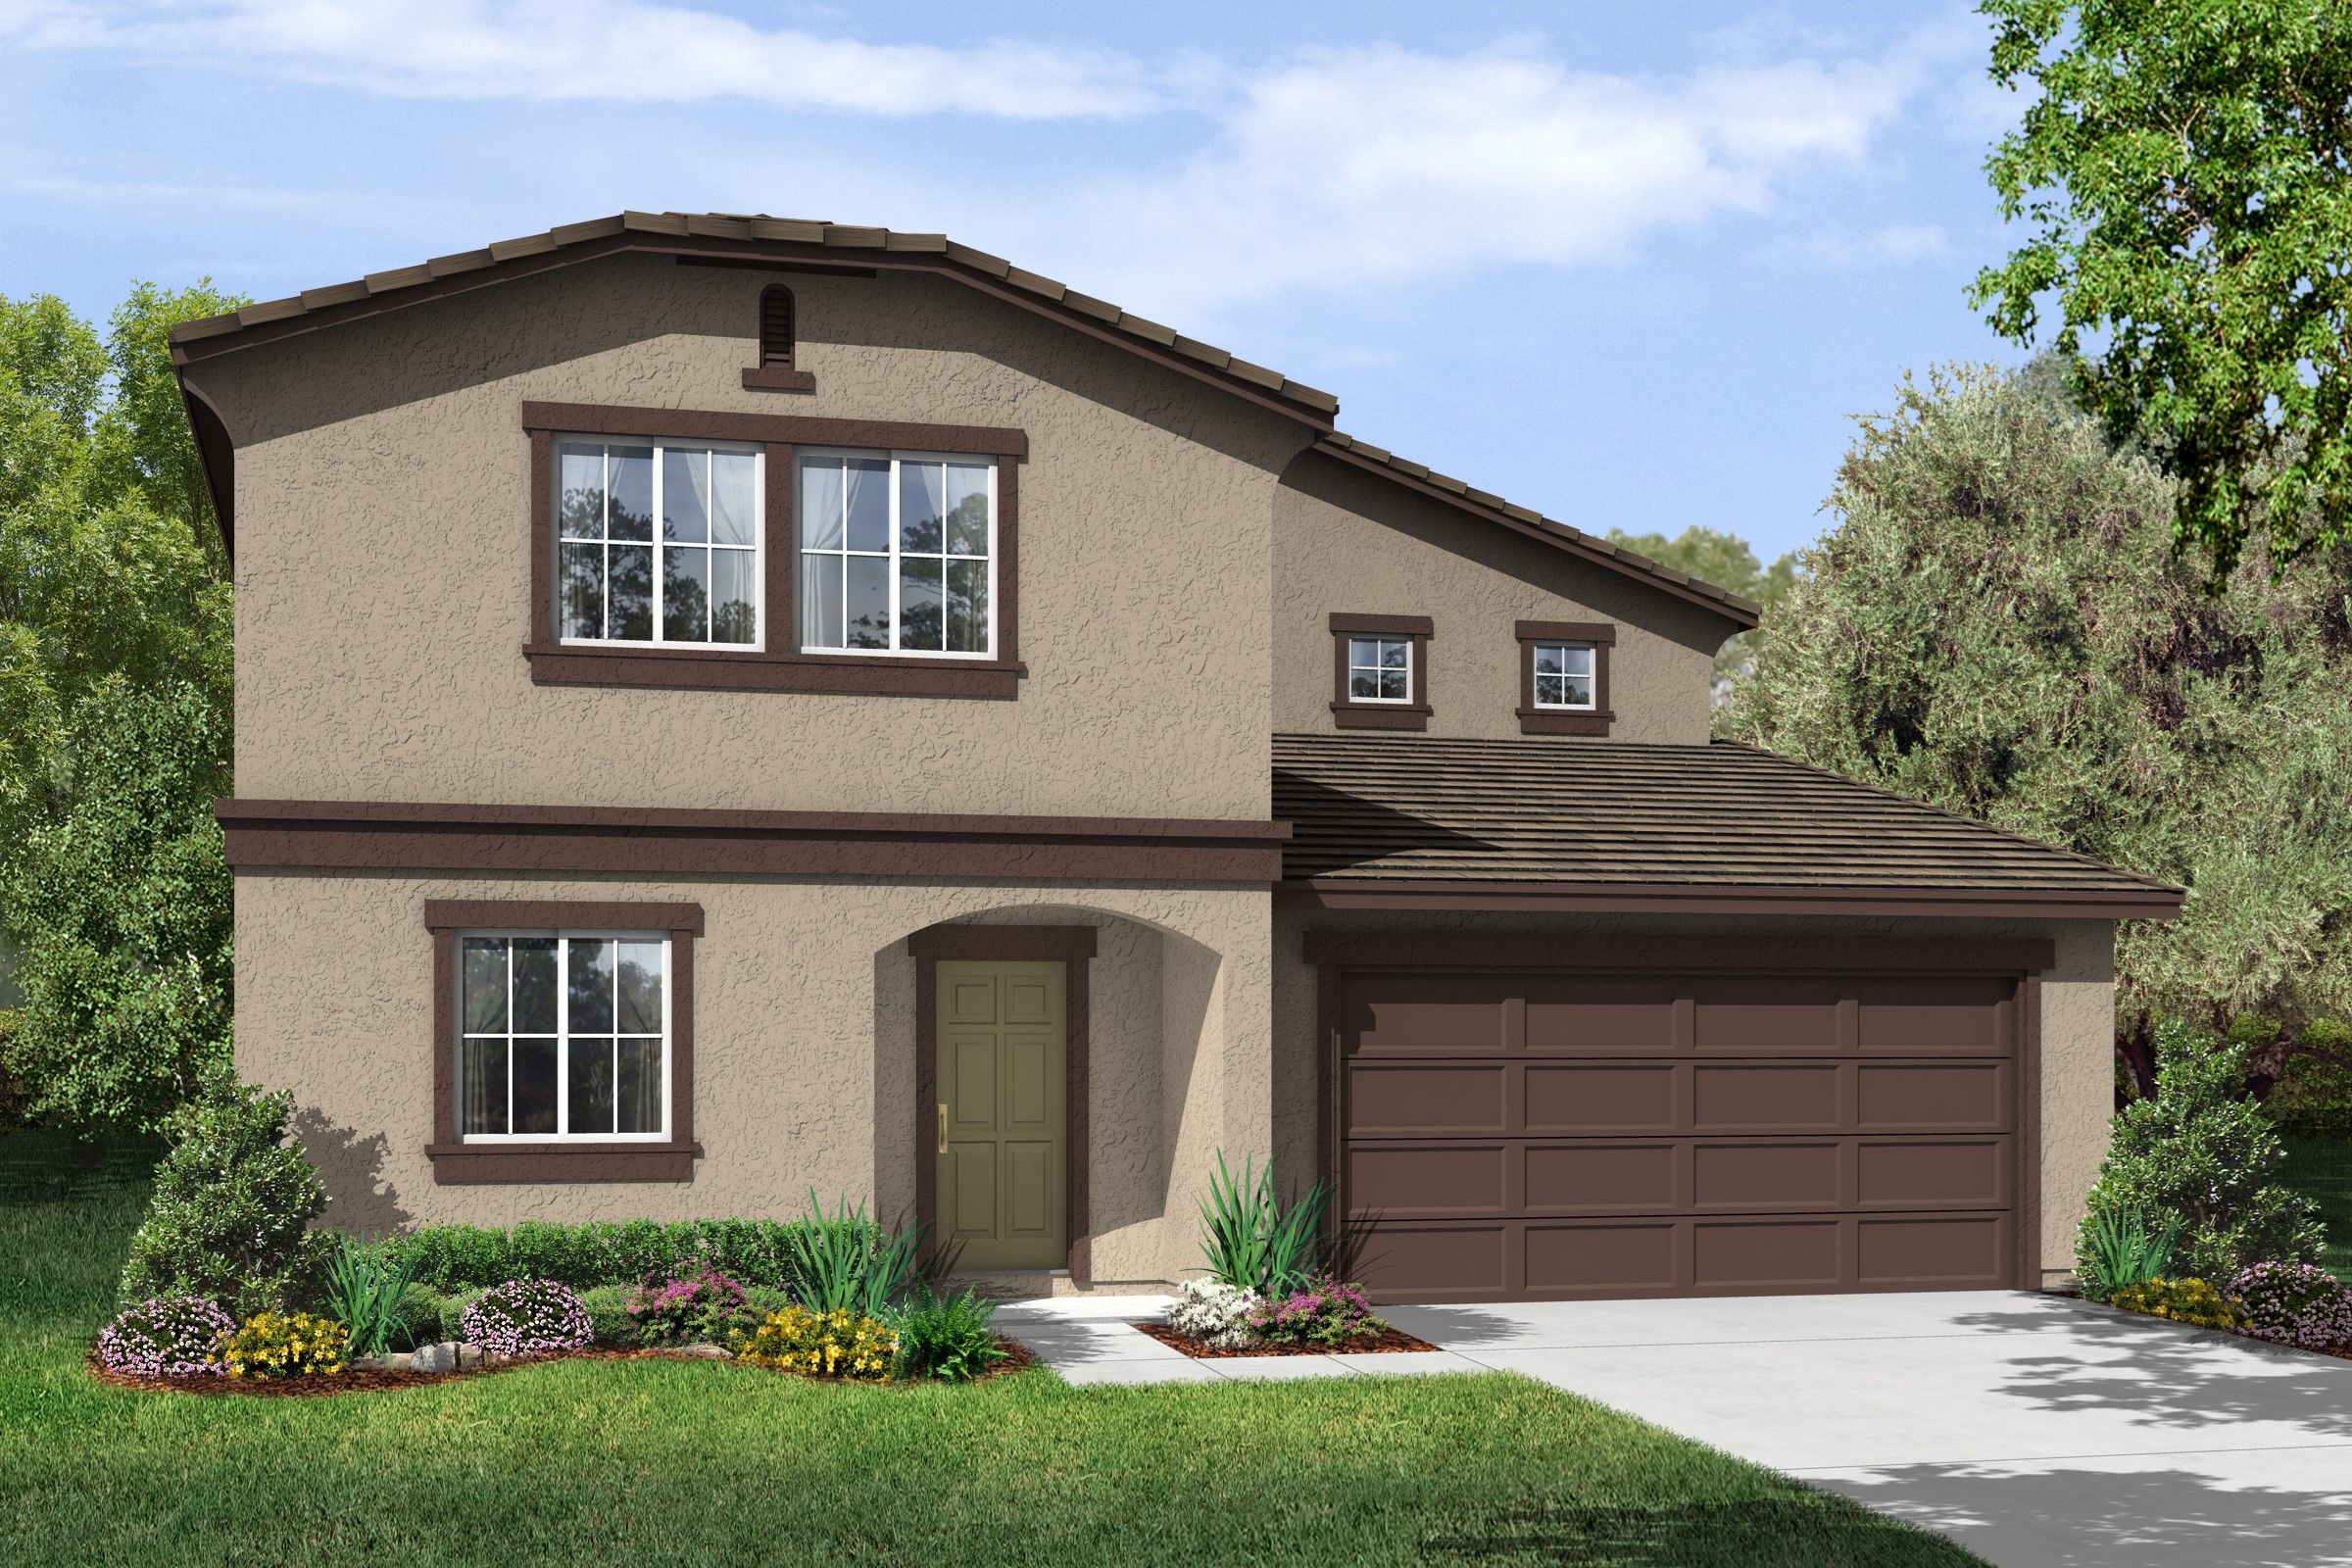 Single Family for Sale at Aspire - Sol 2101 Rayo Del Luna Drive Arvin, California 93203 United States